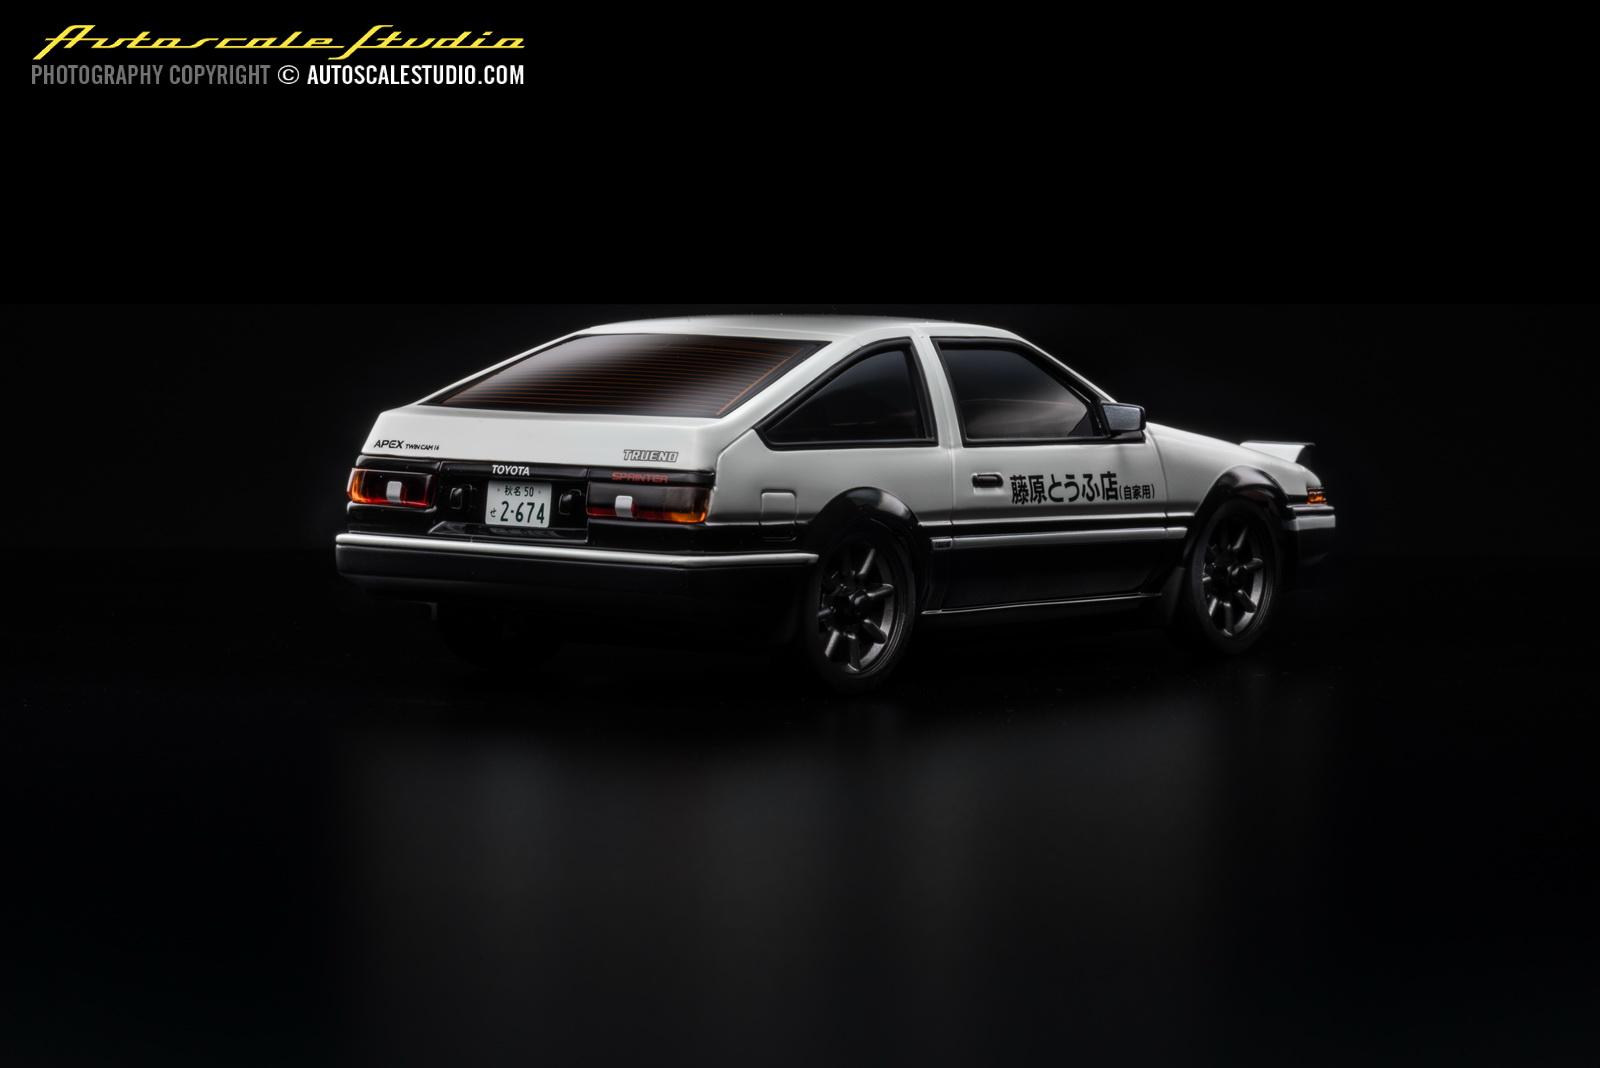 Toyota Sprinter Trueno IX 1995 - 2000 Coupe #1